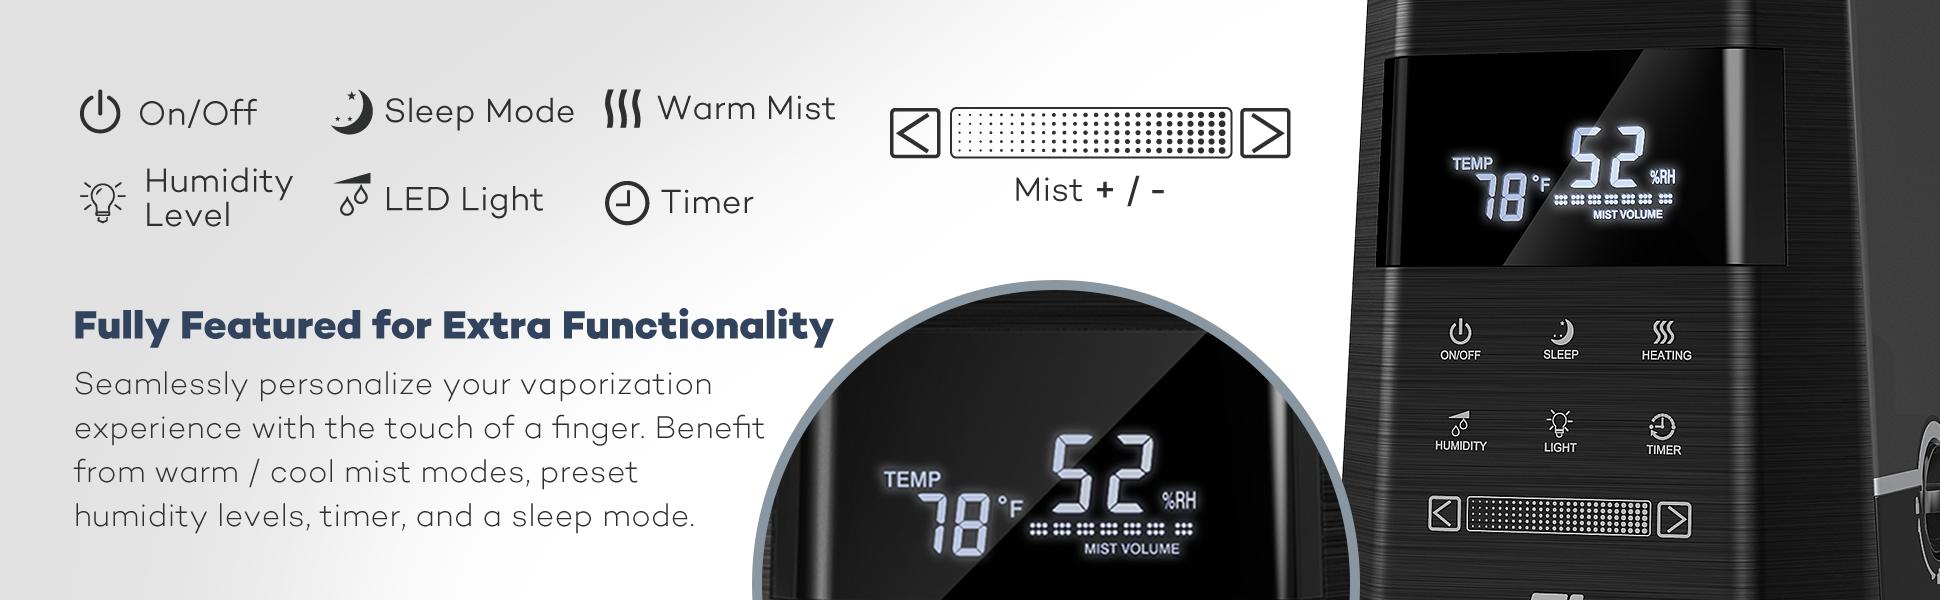 Taotronics ultrasonic humidifiers for bedroom for Bedroom 80 humidity